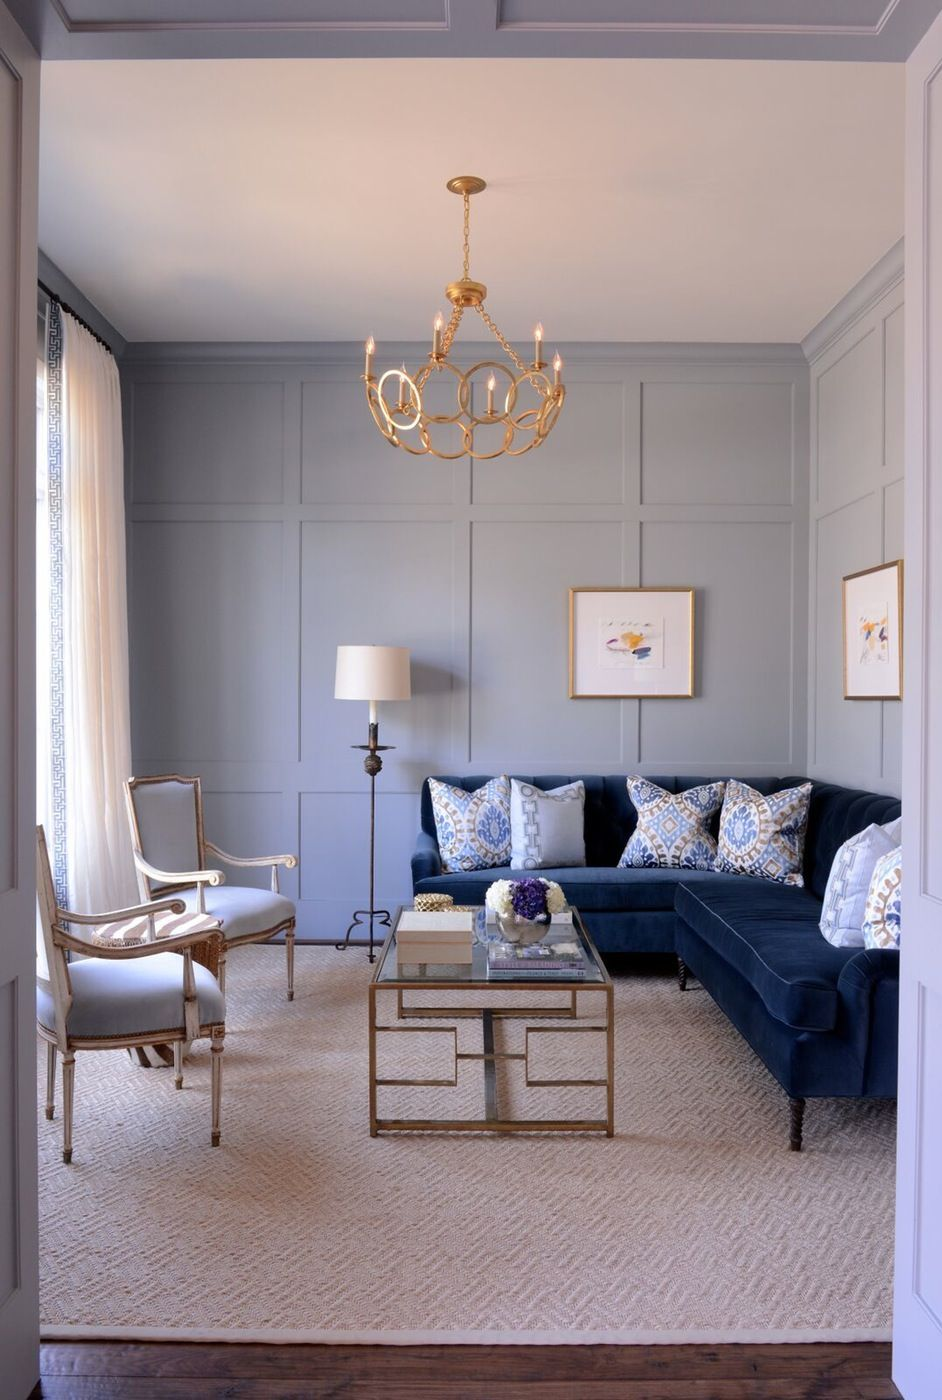 Munger Interiors Portfolio Interiors Styles Jpeg Ixlib Rails 1 1 Blue Couch Living Room Blue Sofa Living Blue Couch Living